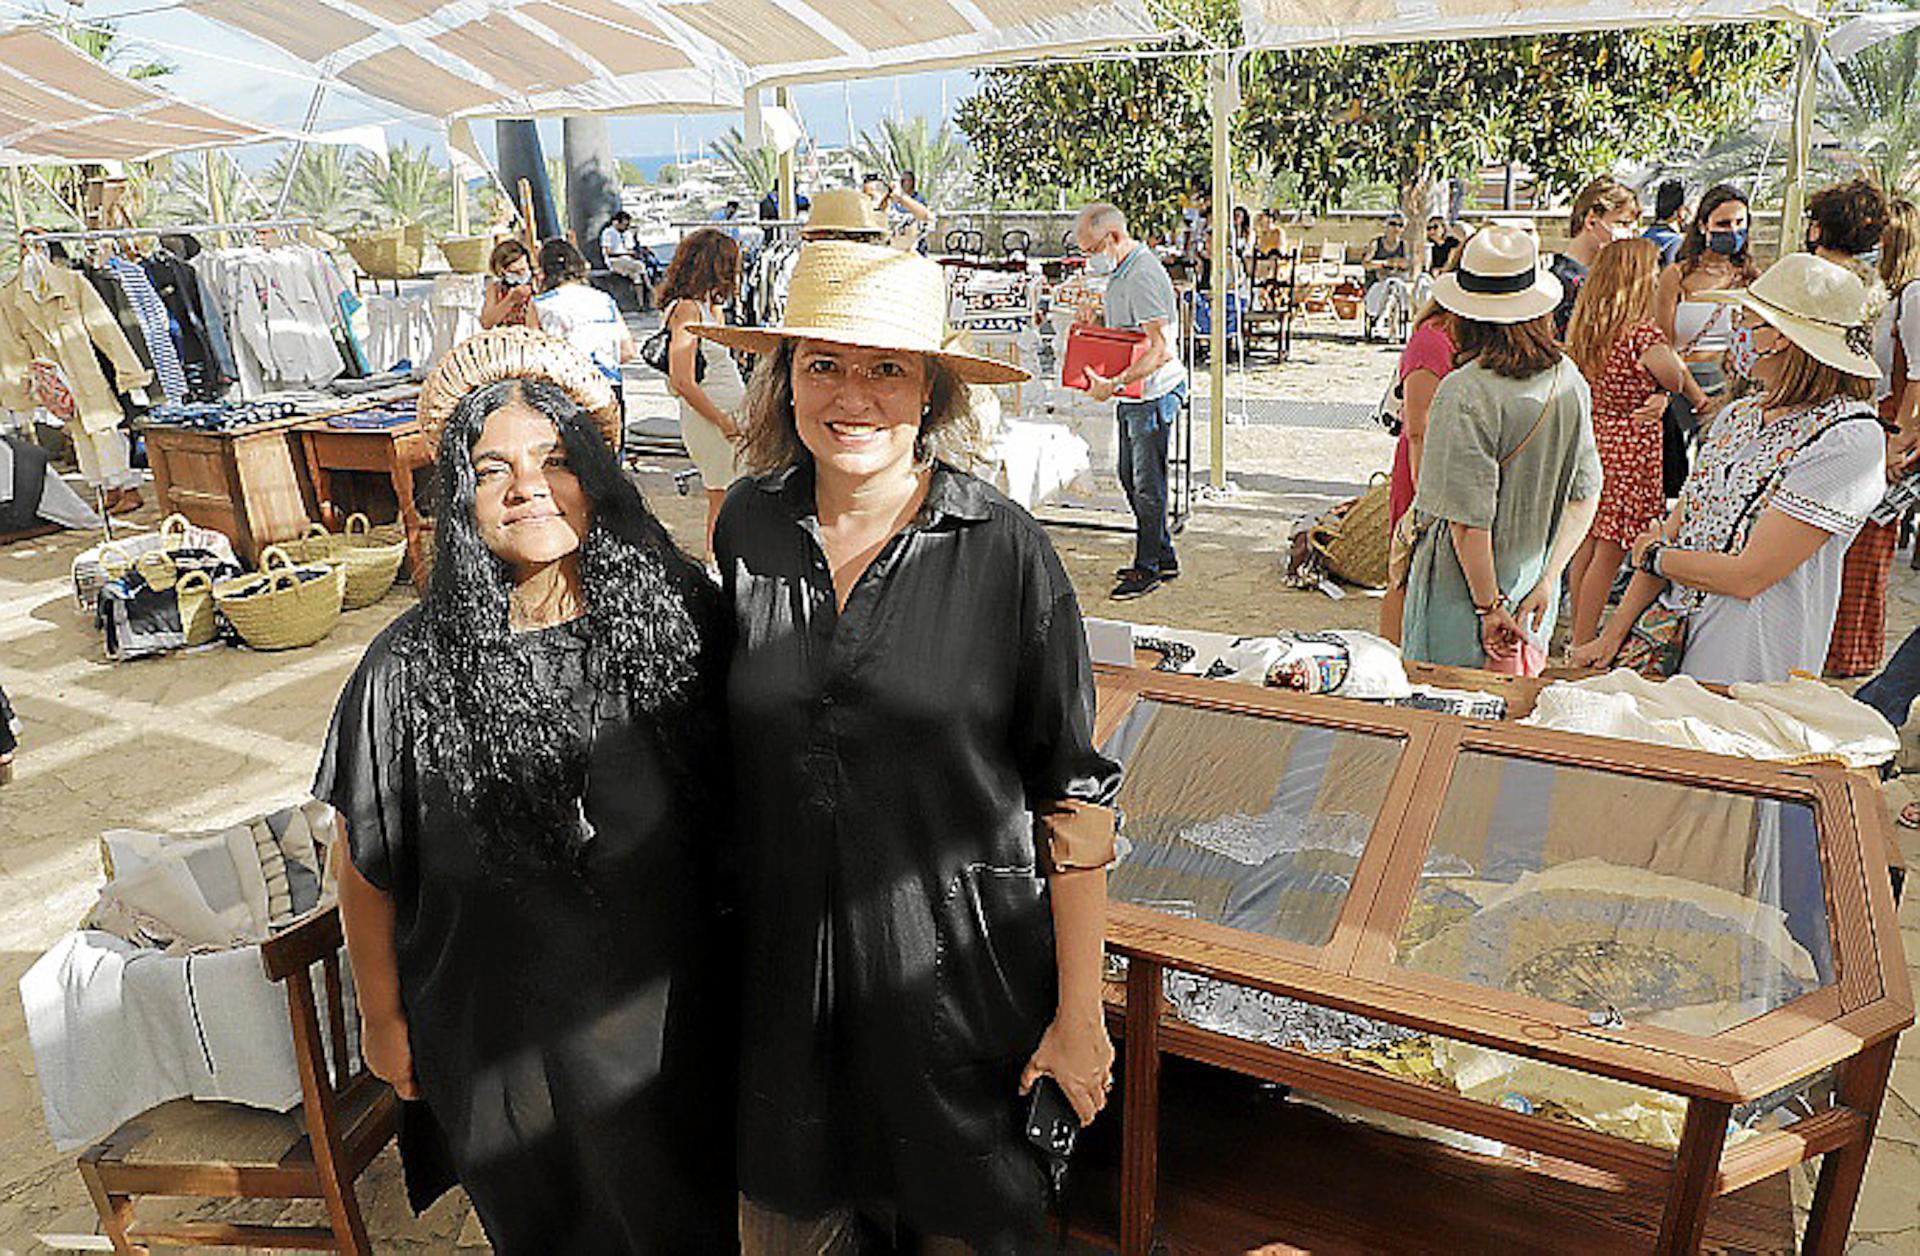 Marcela Echavarría & Kavita Parmar at Xtant 2021 Textile Craft Exhibition.